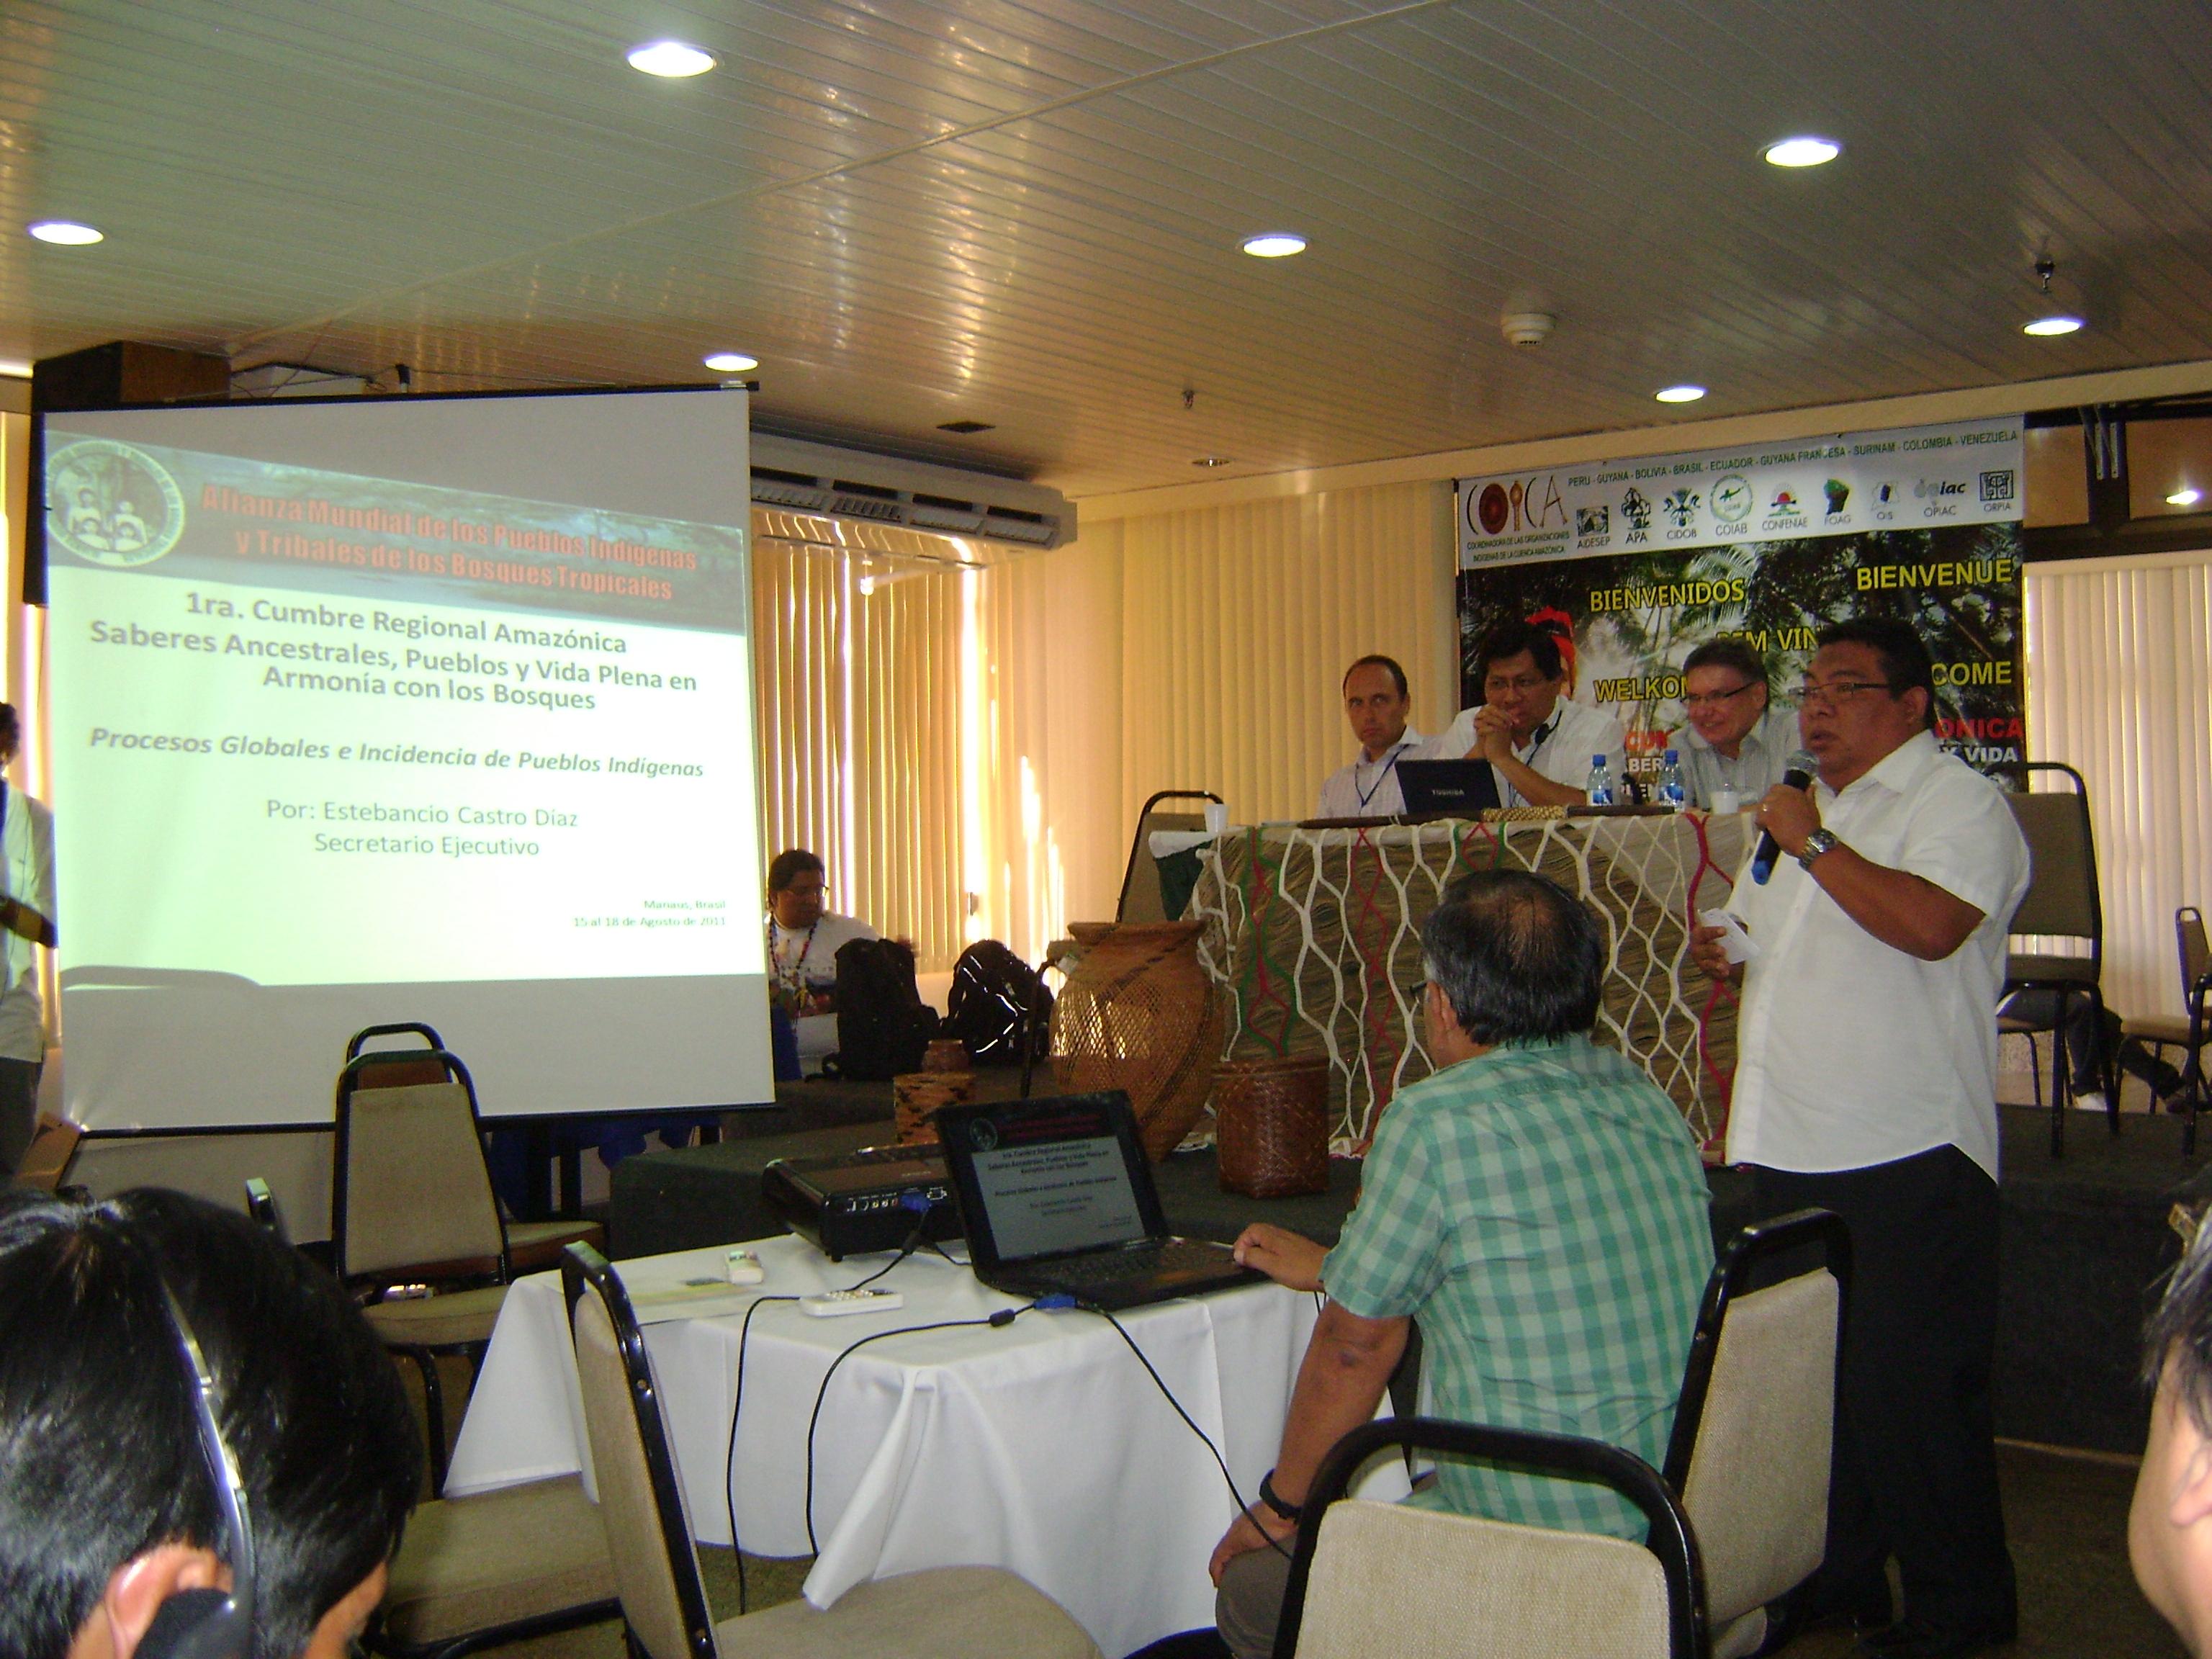 Speech on deforestation in the amazon